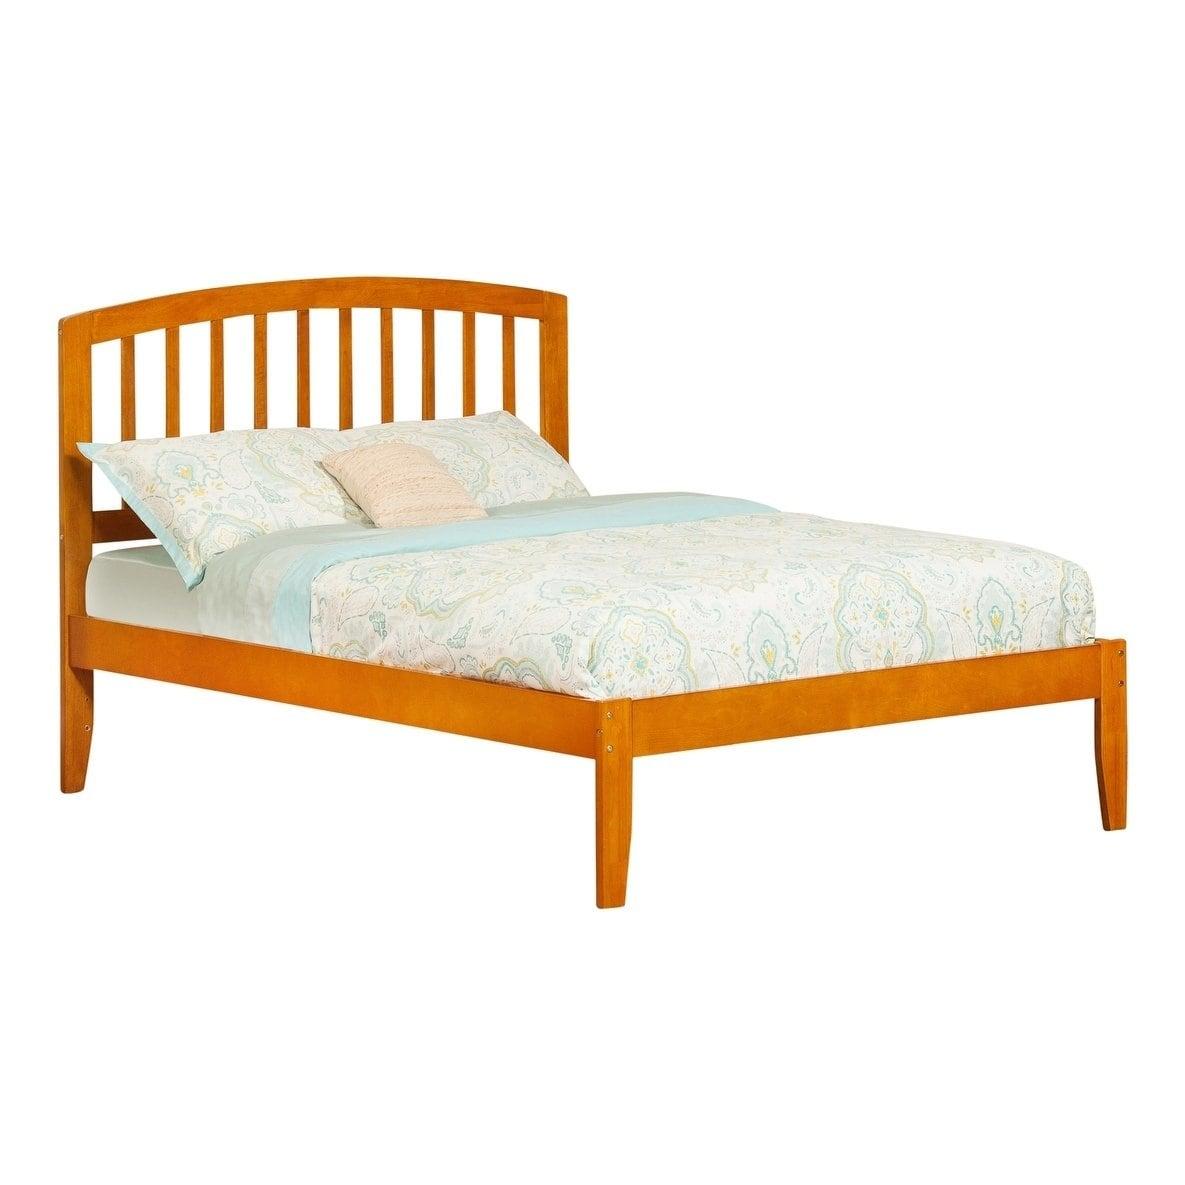 Atlantic Furniture Richmond Caramel Latte Full Open Foot Bed